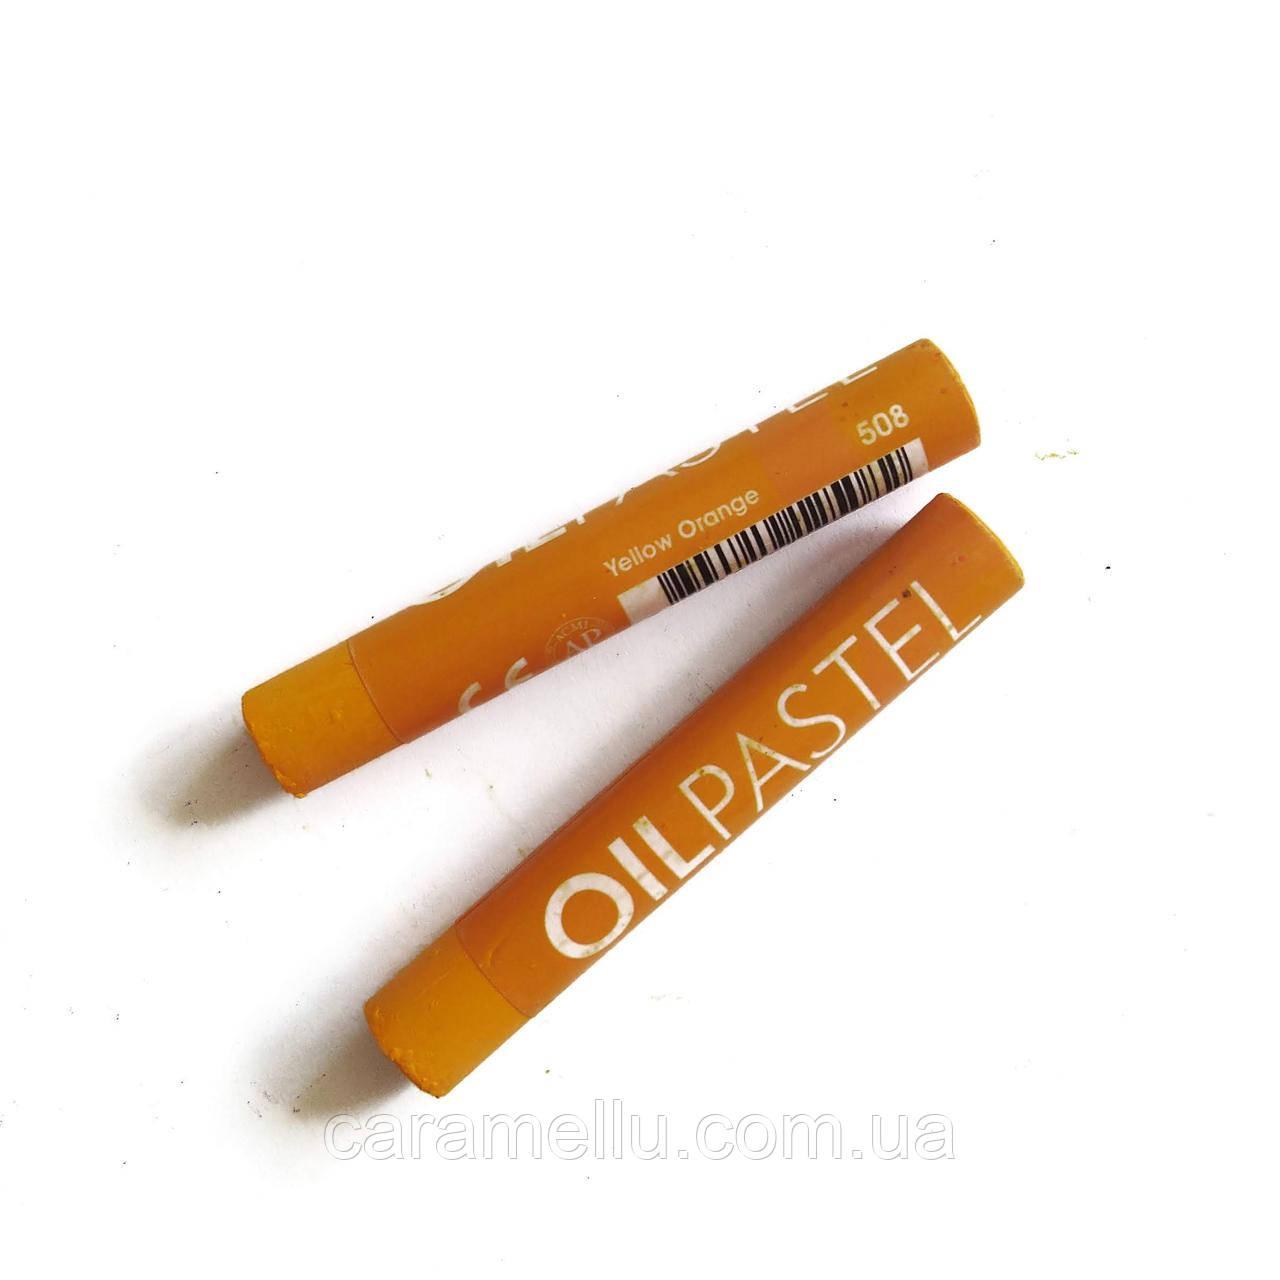 Масляная пастель. №508 Желто-оранжевый. Mongyo